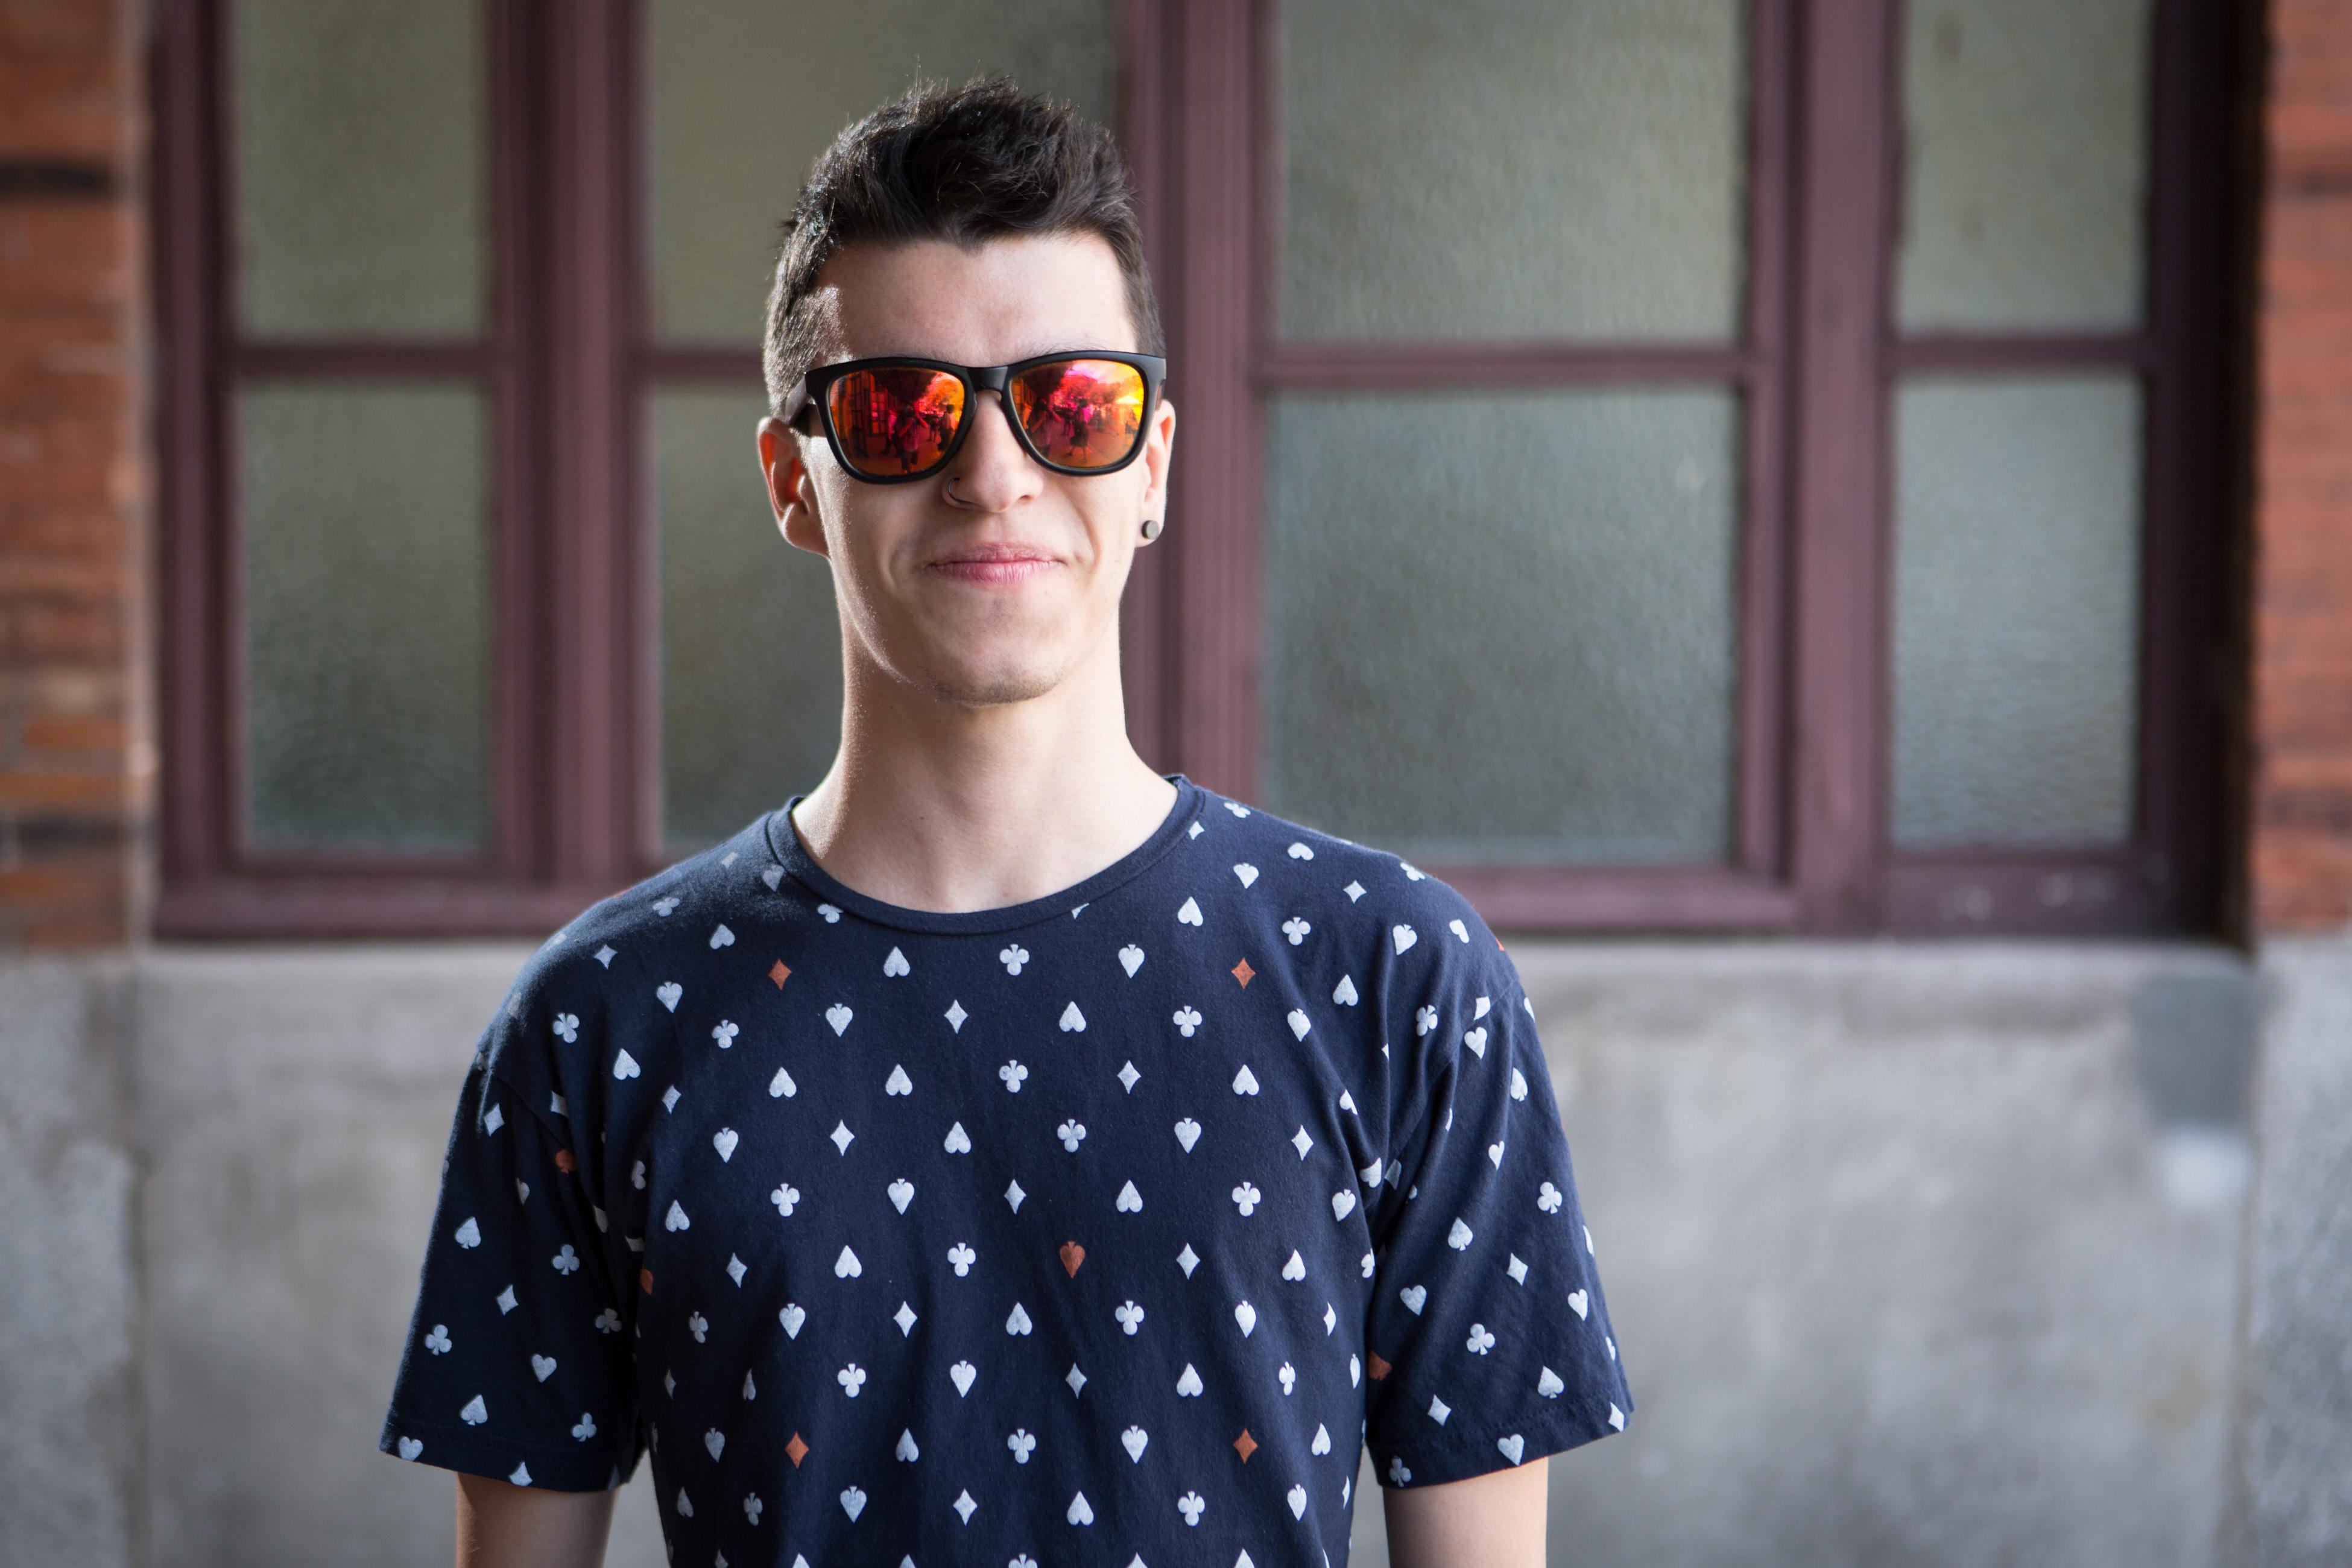 A man in an indigo shirt and sunglasses.